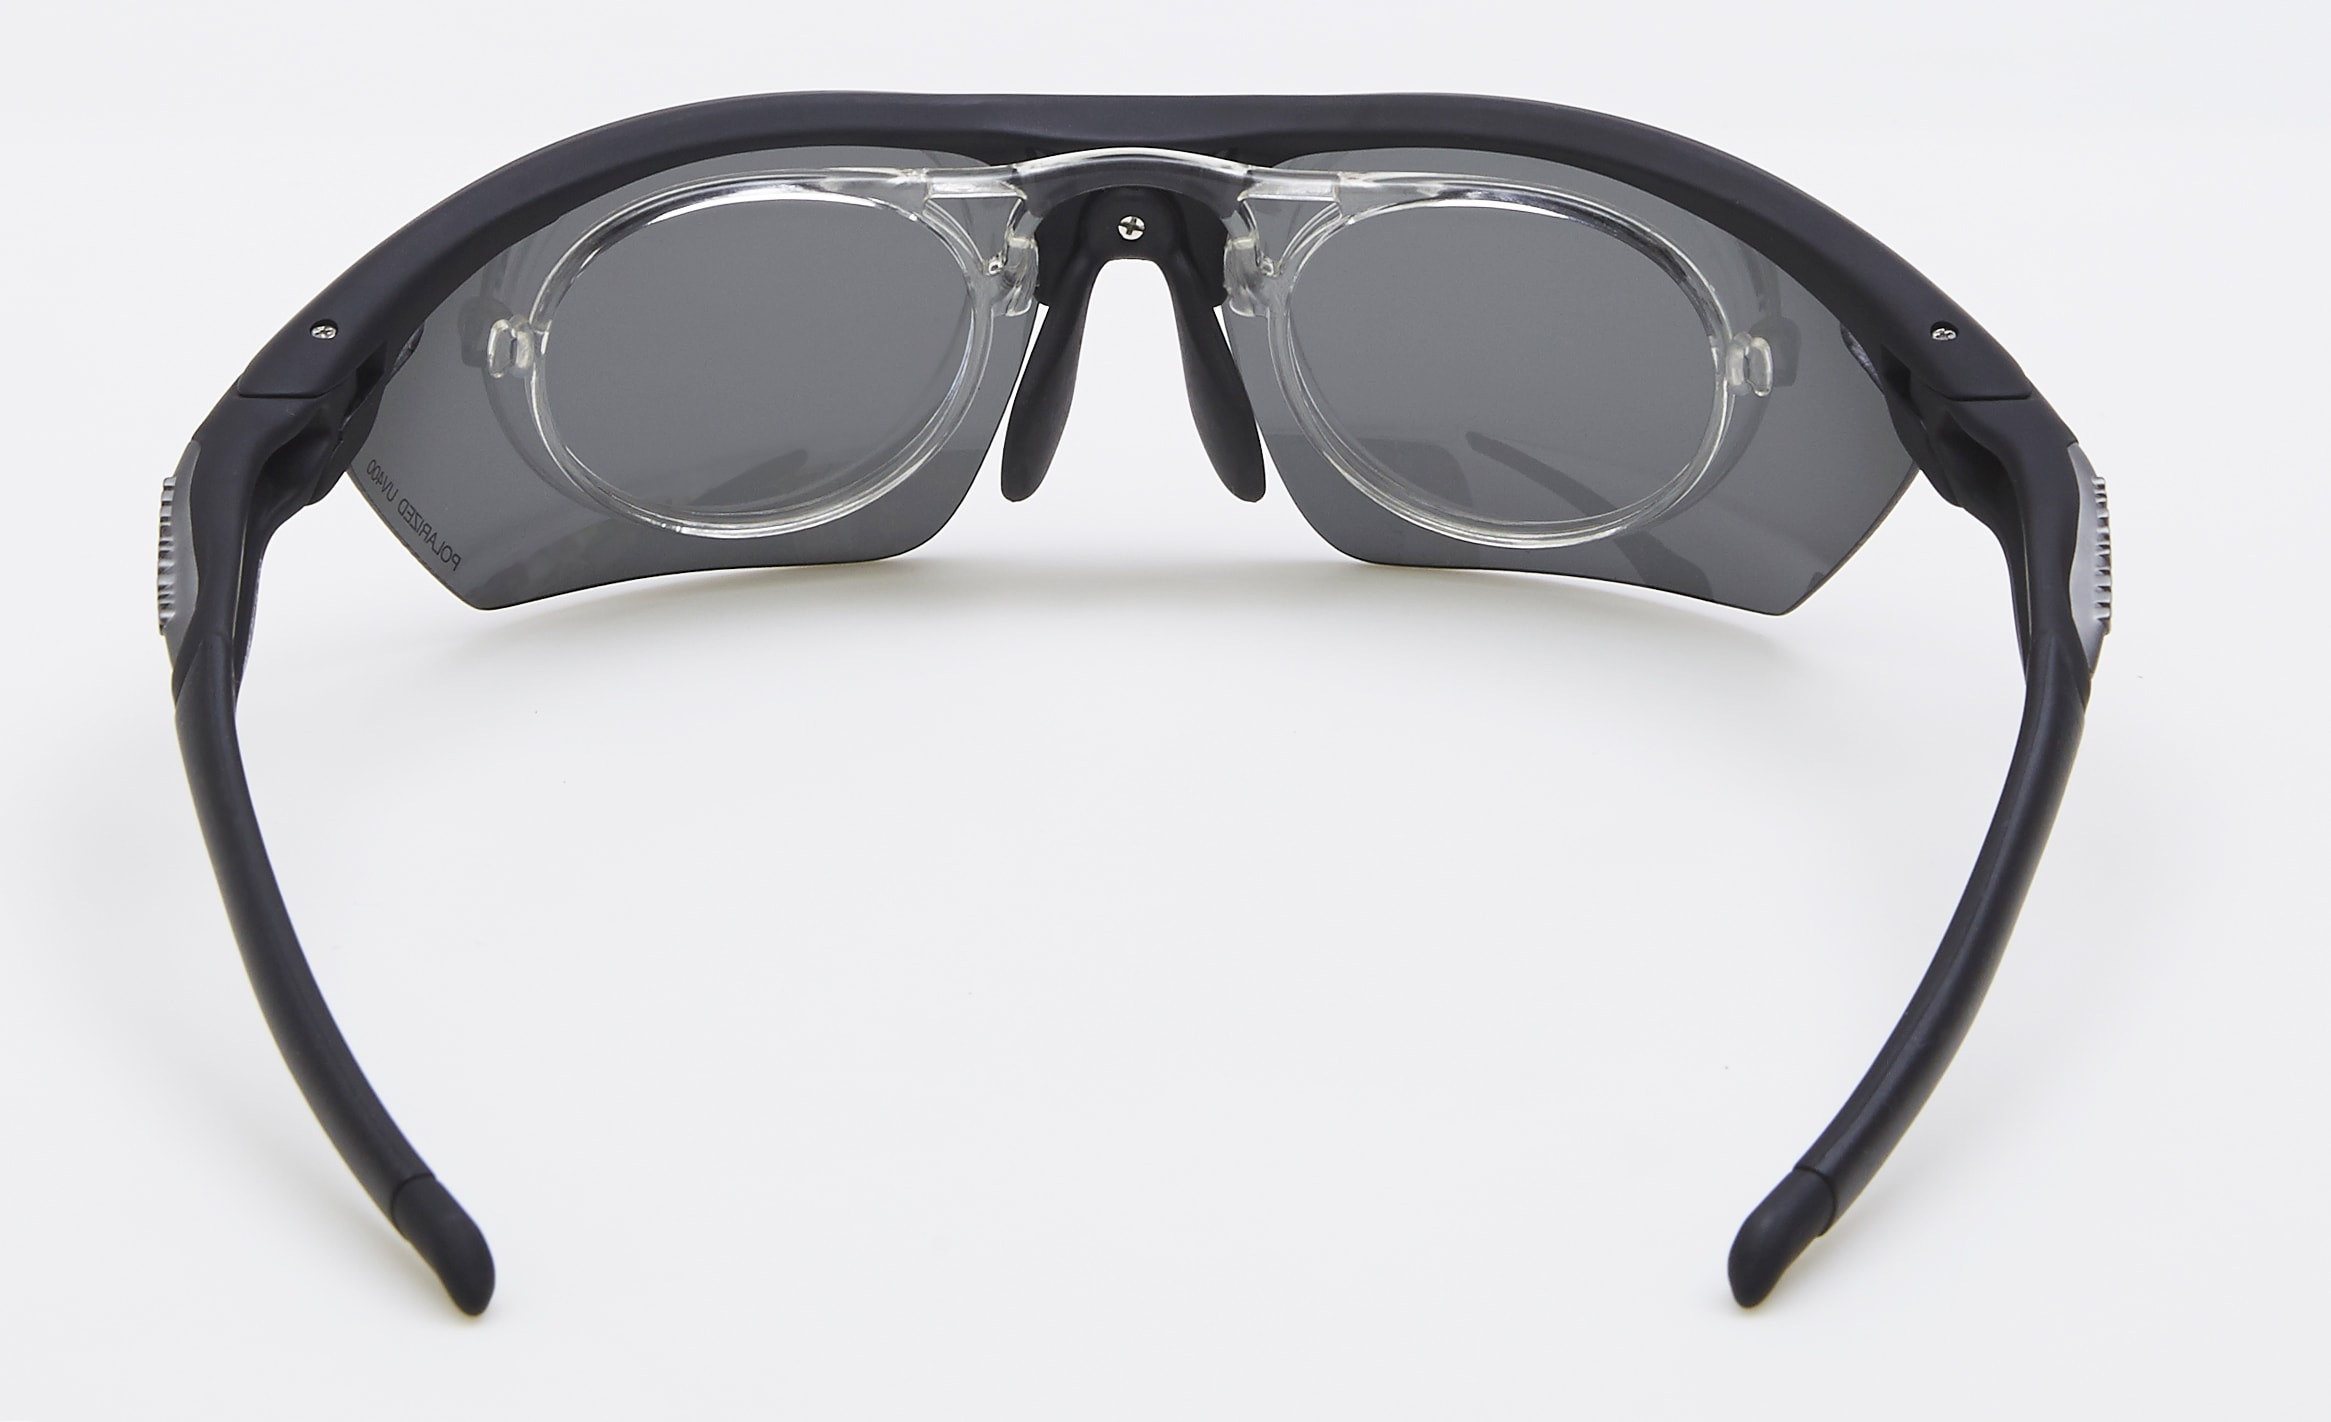 clip optico feel morys ms-049 negra polarizada